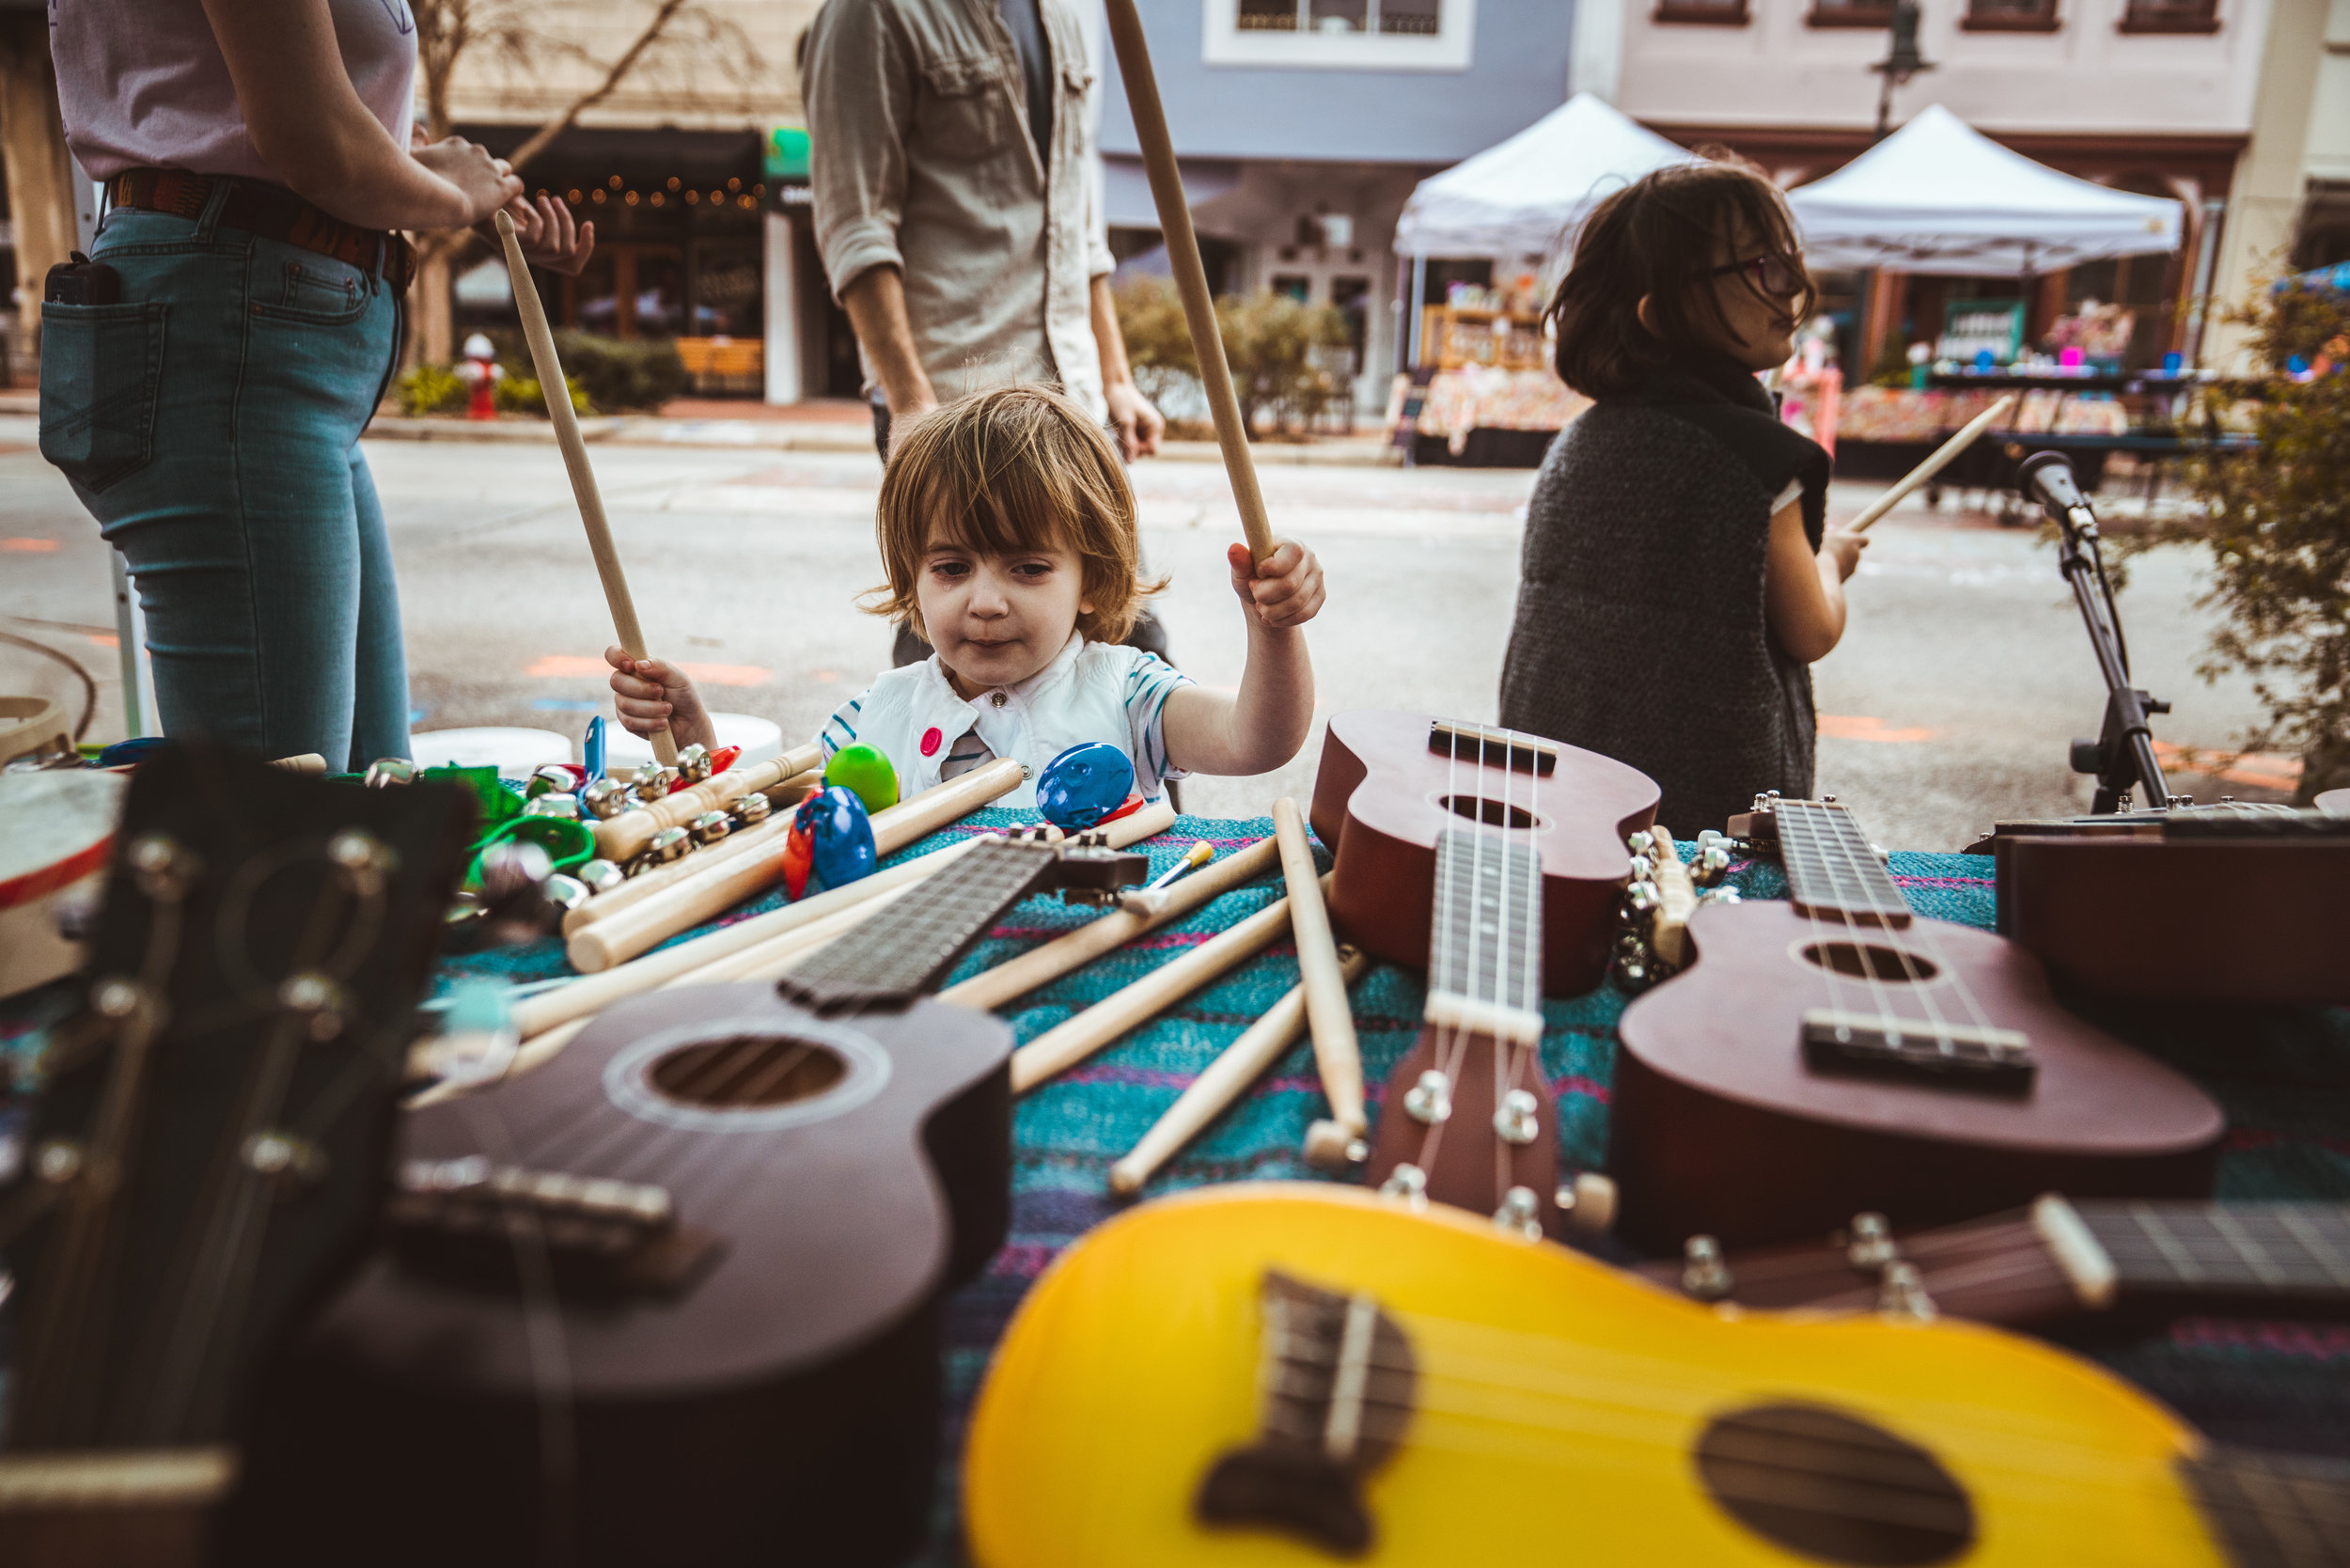 Kids Block station by Paul Chelmis